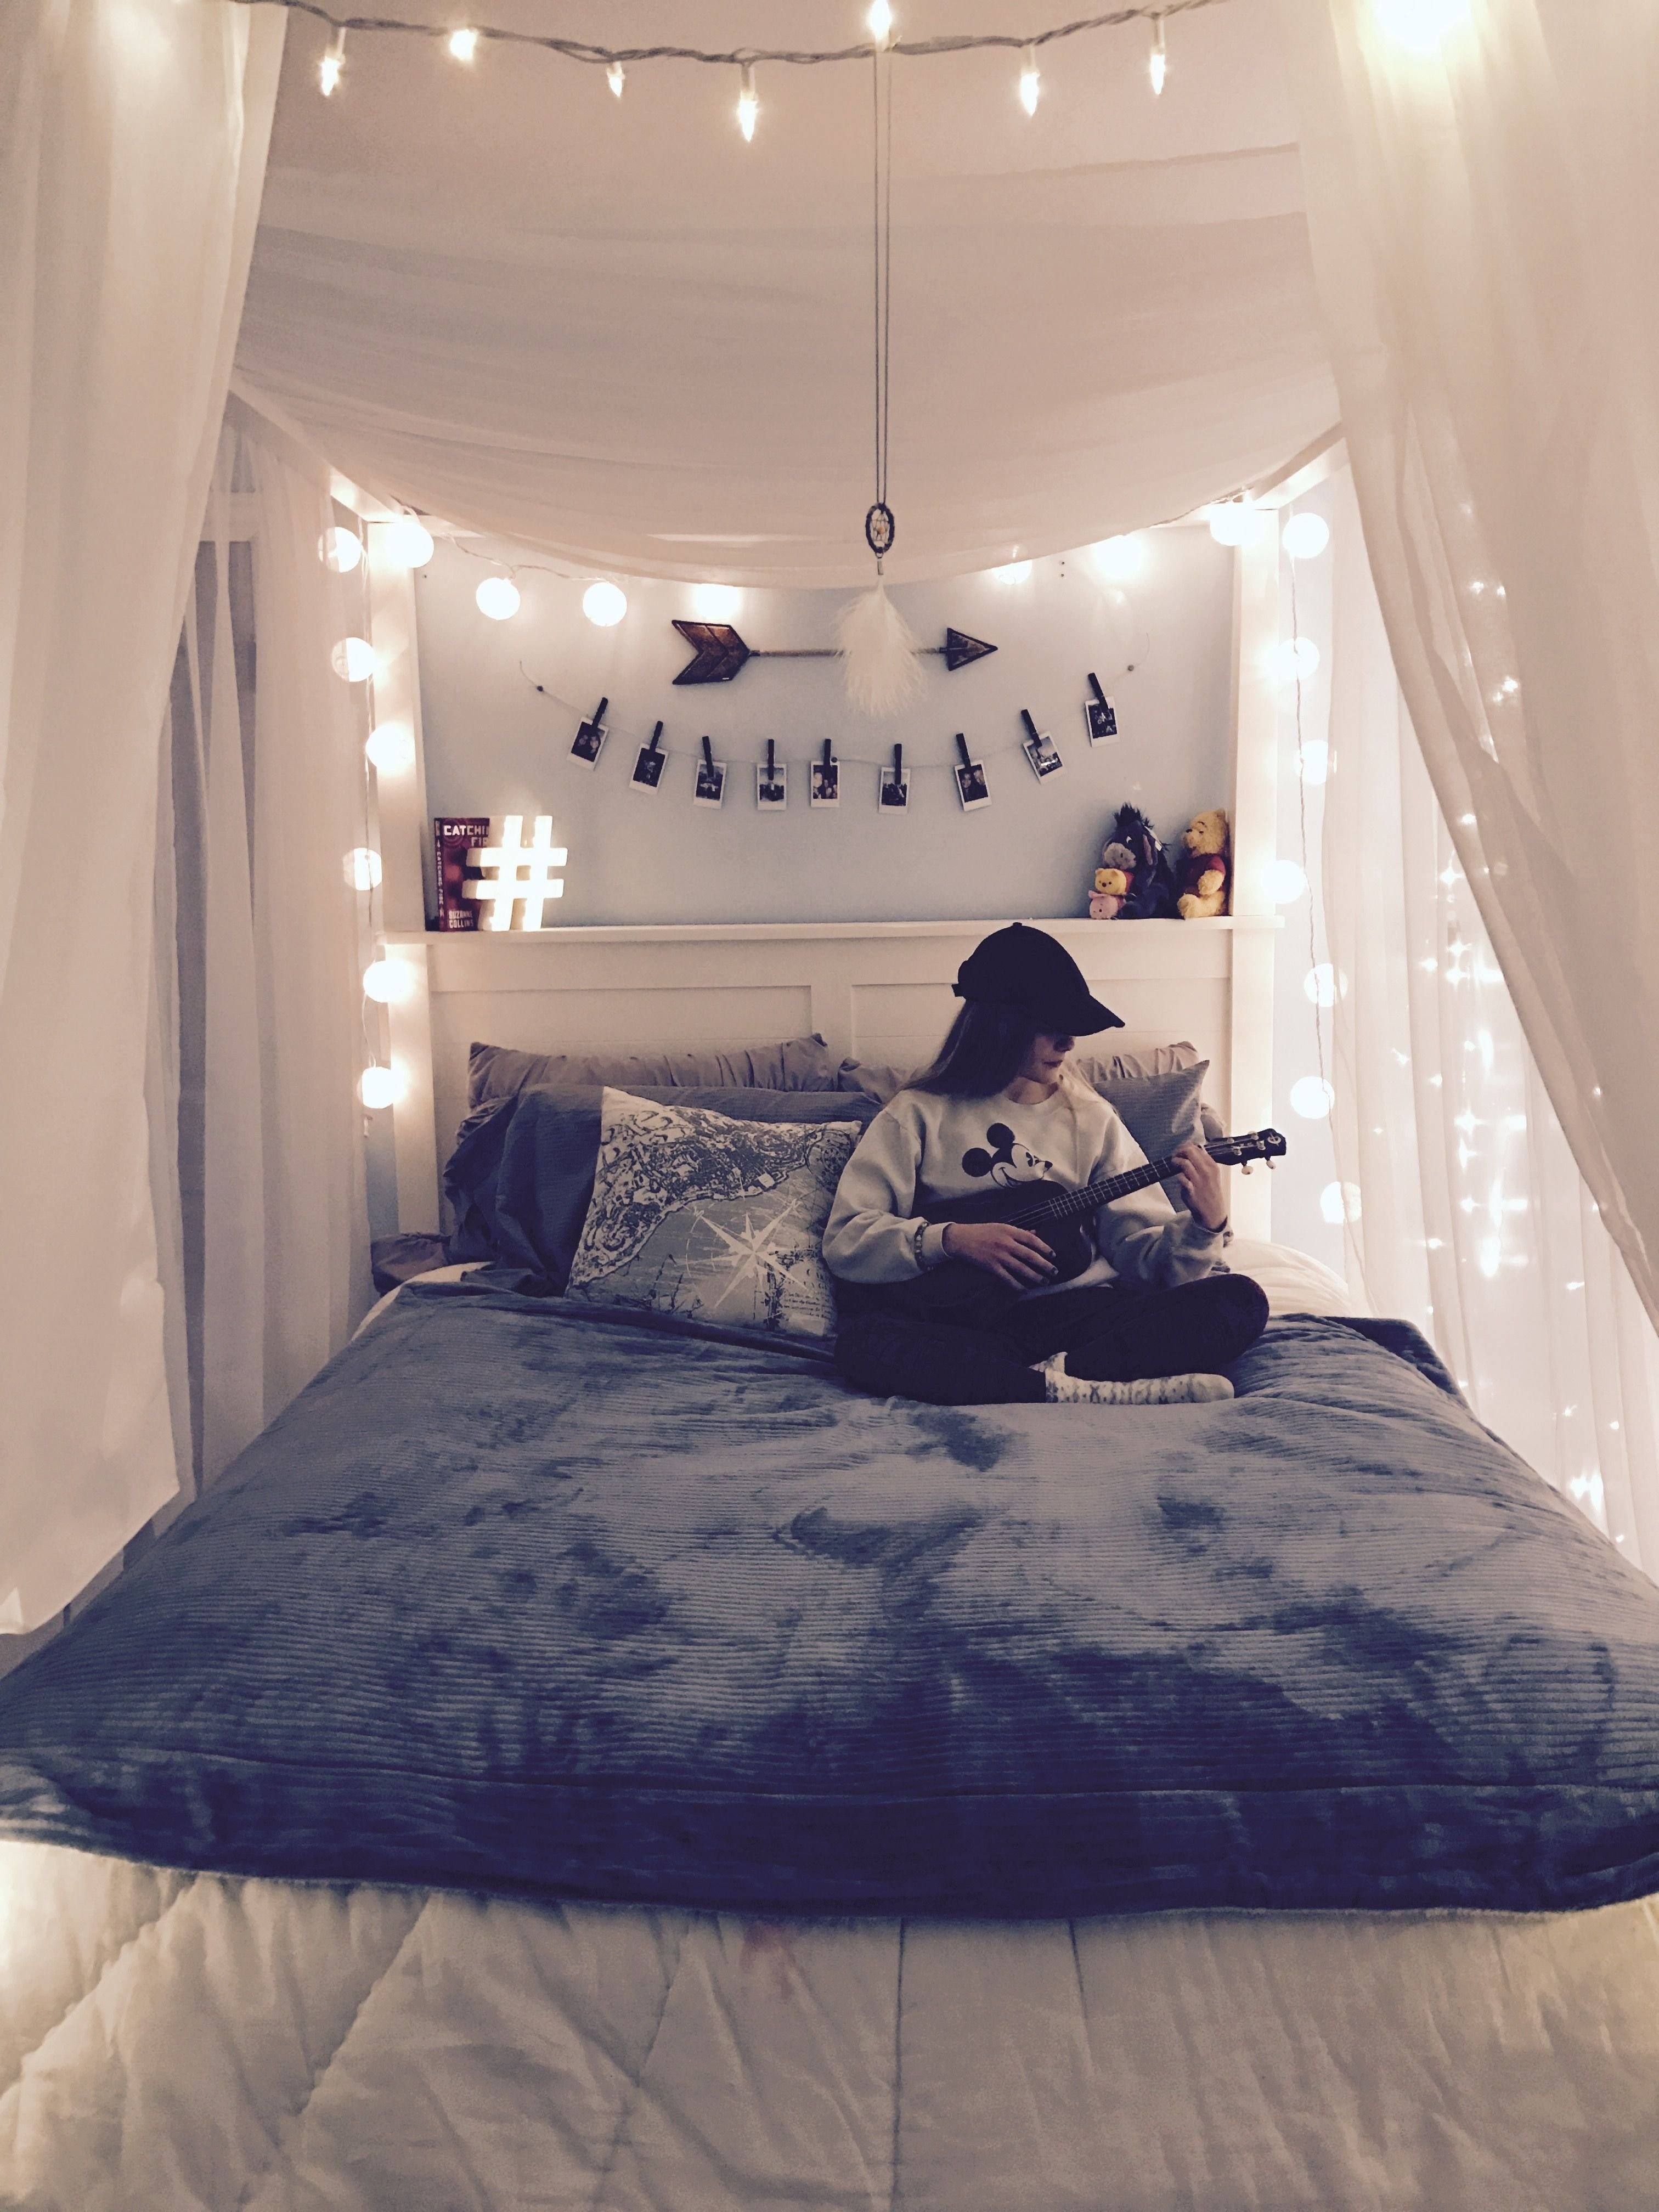 10 Amazing Teenage Bedroom Ideas For Girls teen bedroom makeover ideas teen bedrooms and diy room decor 1